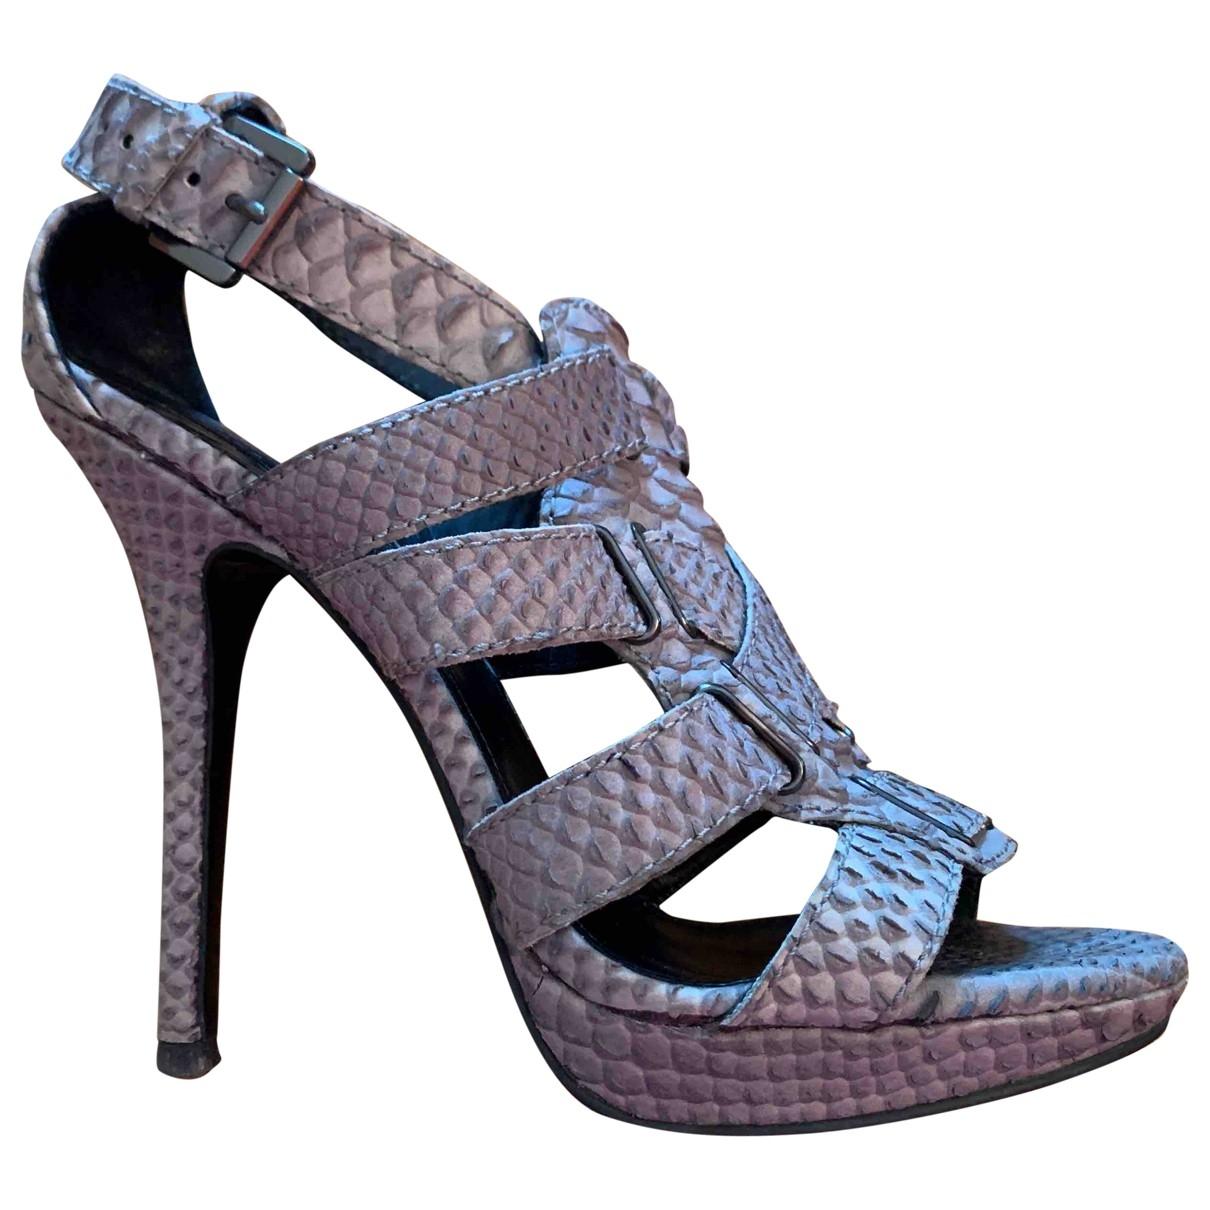 Zara \N Grey Patent leather Sandals for Women 40 EU